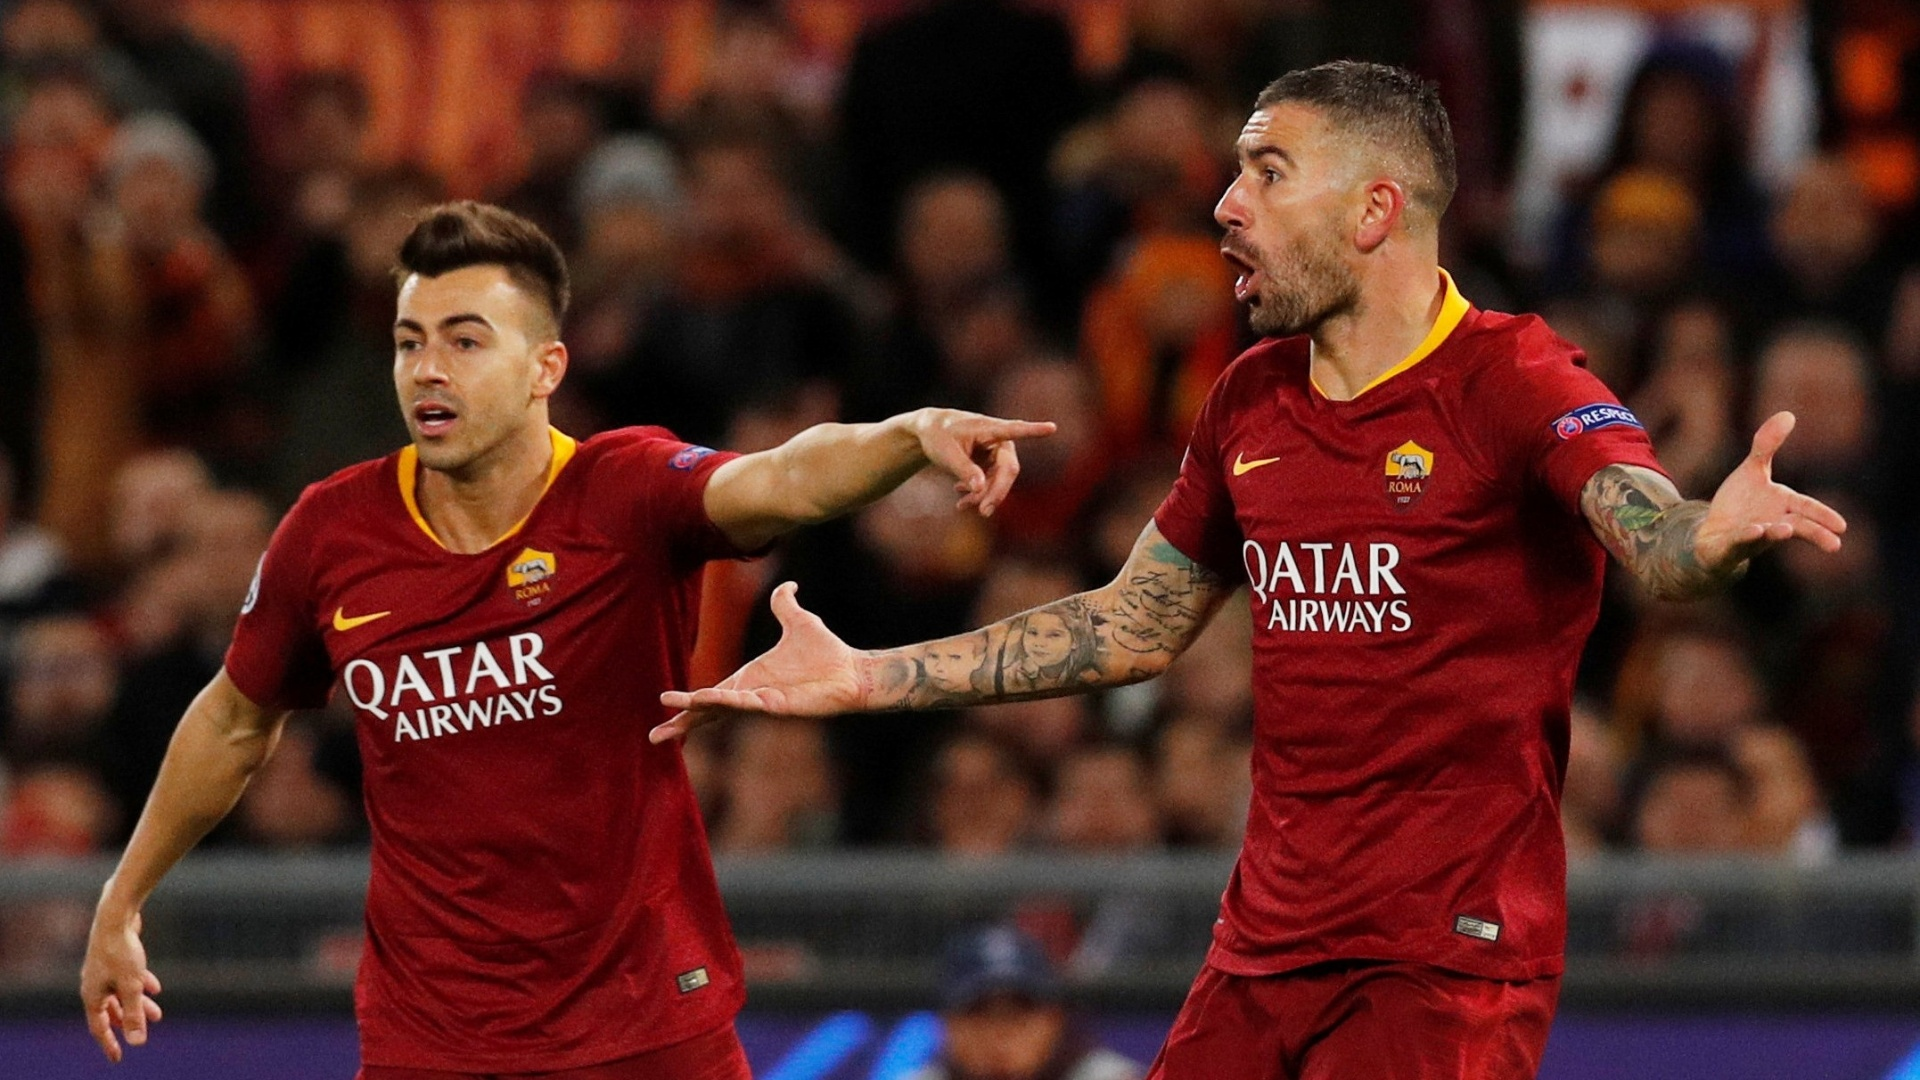 El Shaarawy gesticula ao lado de Kolarov em Roma x Real Madrid